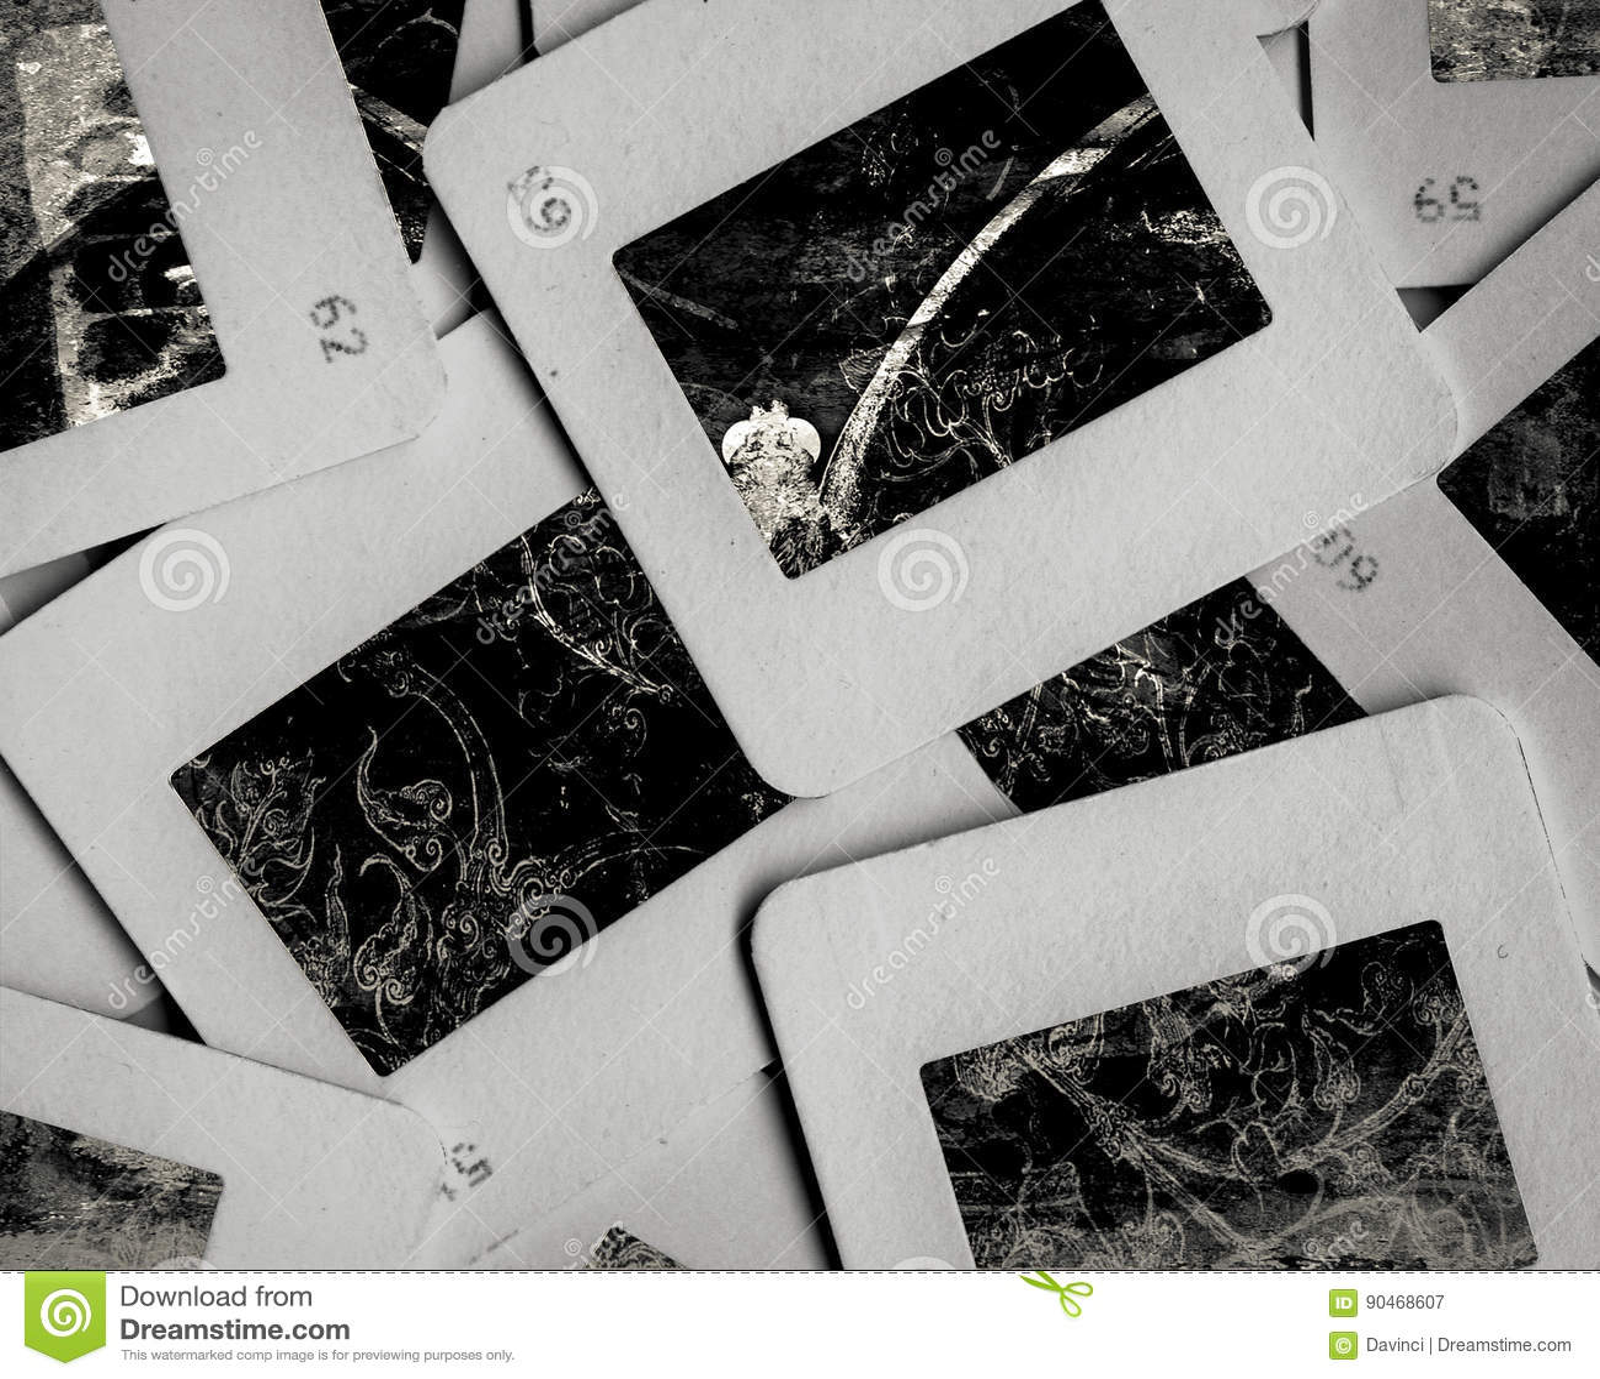 old slide stock image image of memory film paper album 90468607